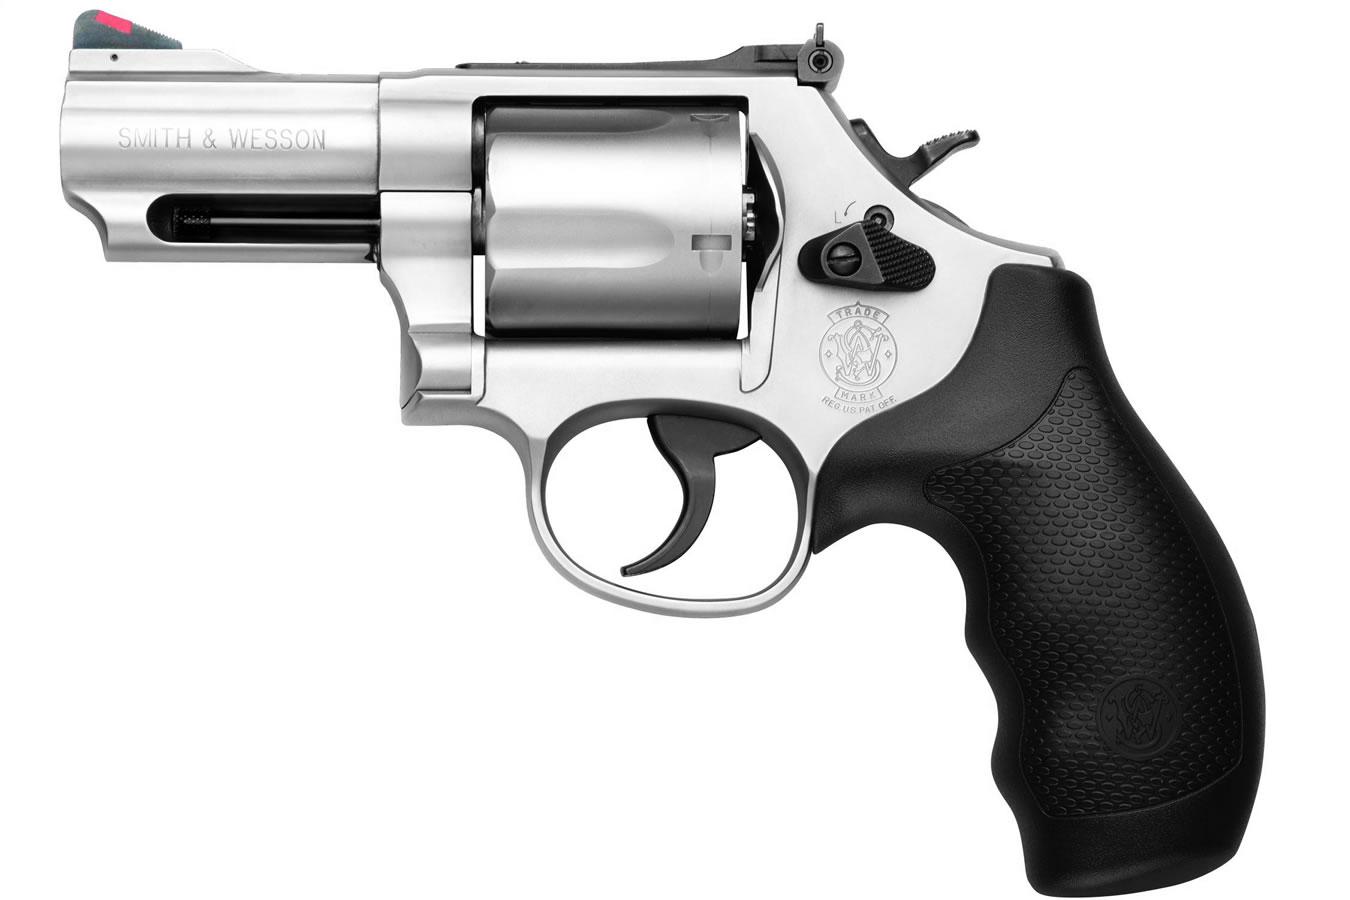 44 magnum revolver images galleries with a bite. Black Bedroom Furniture Sets. Home Design Ideas